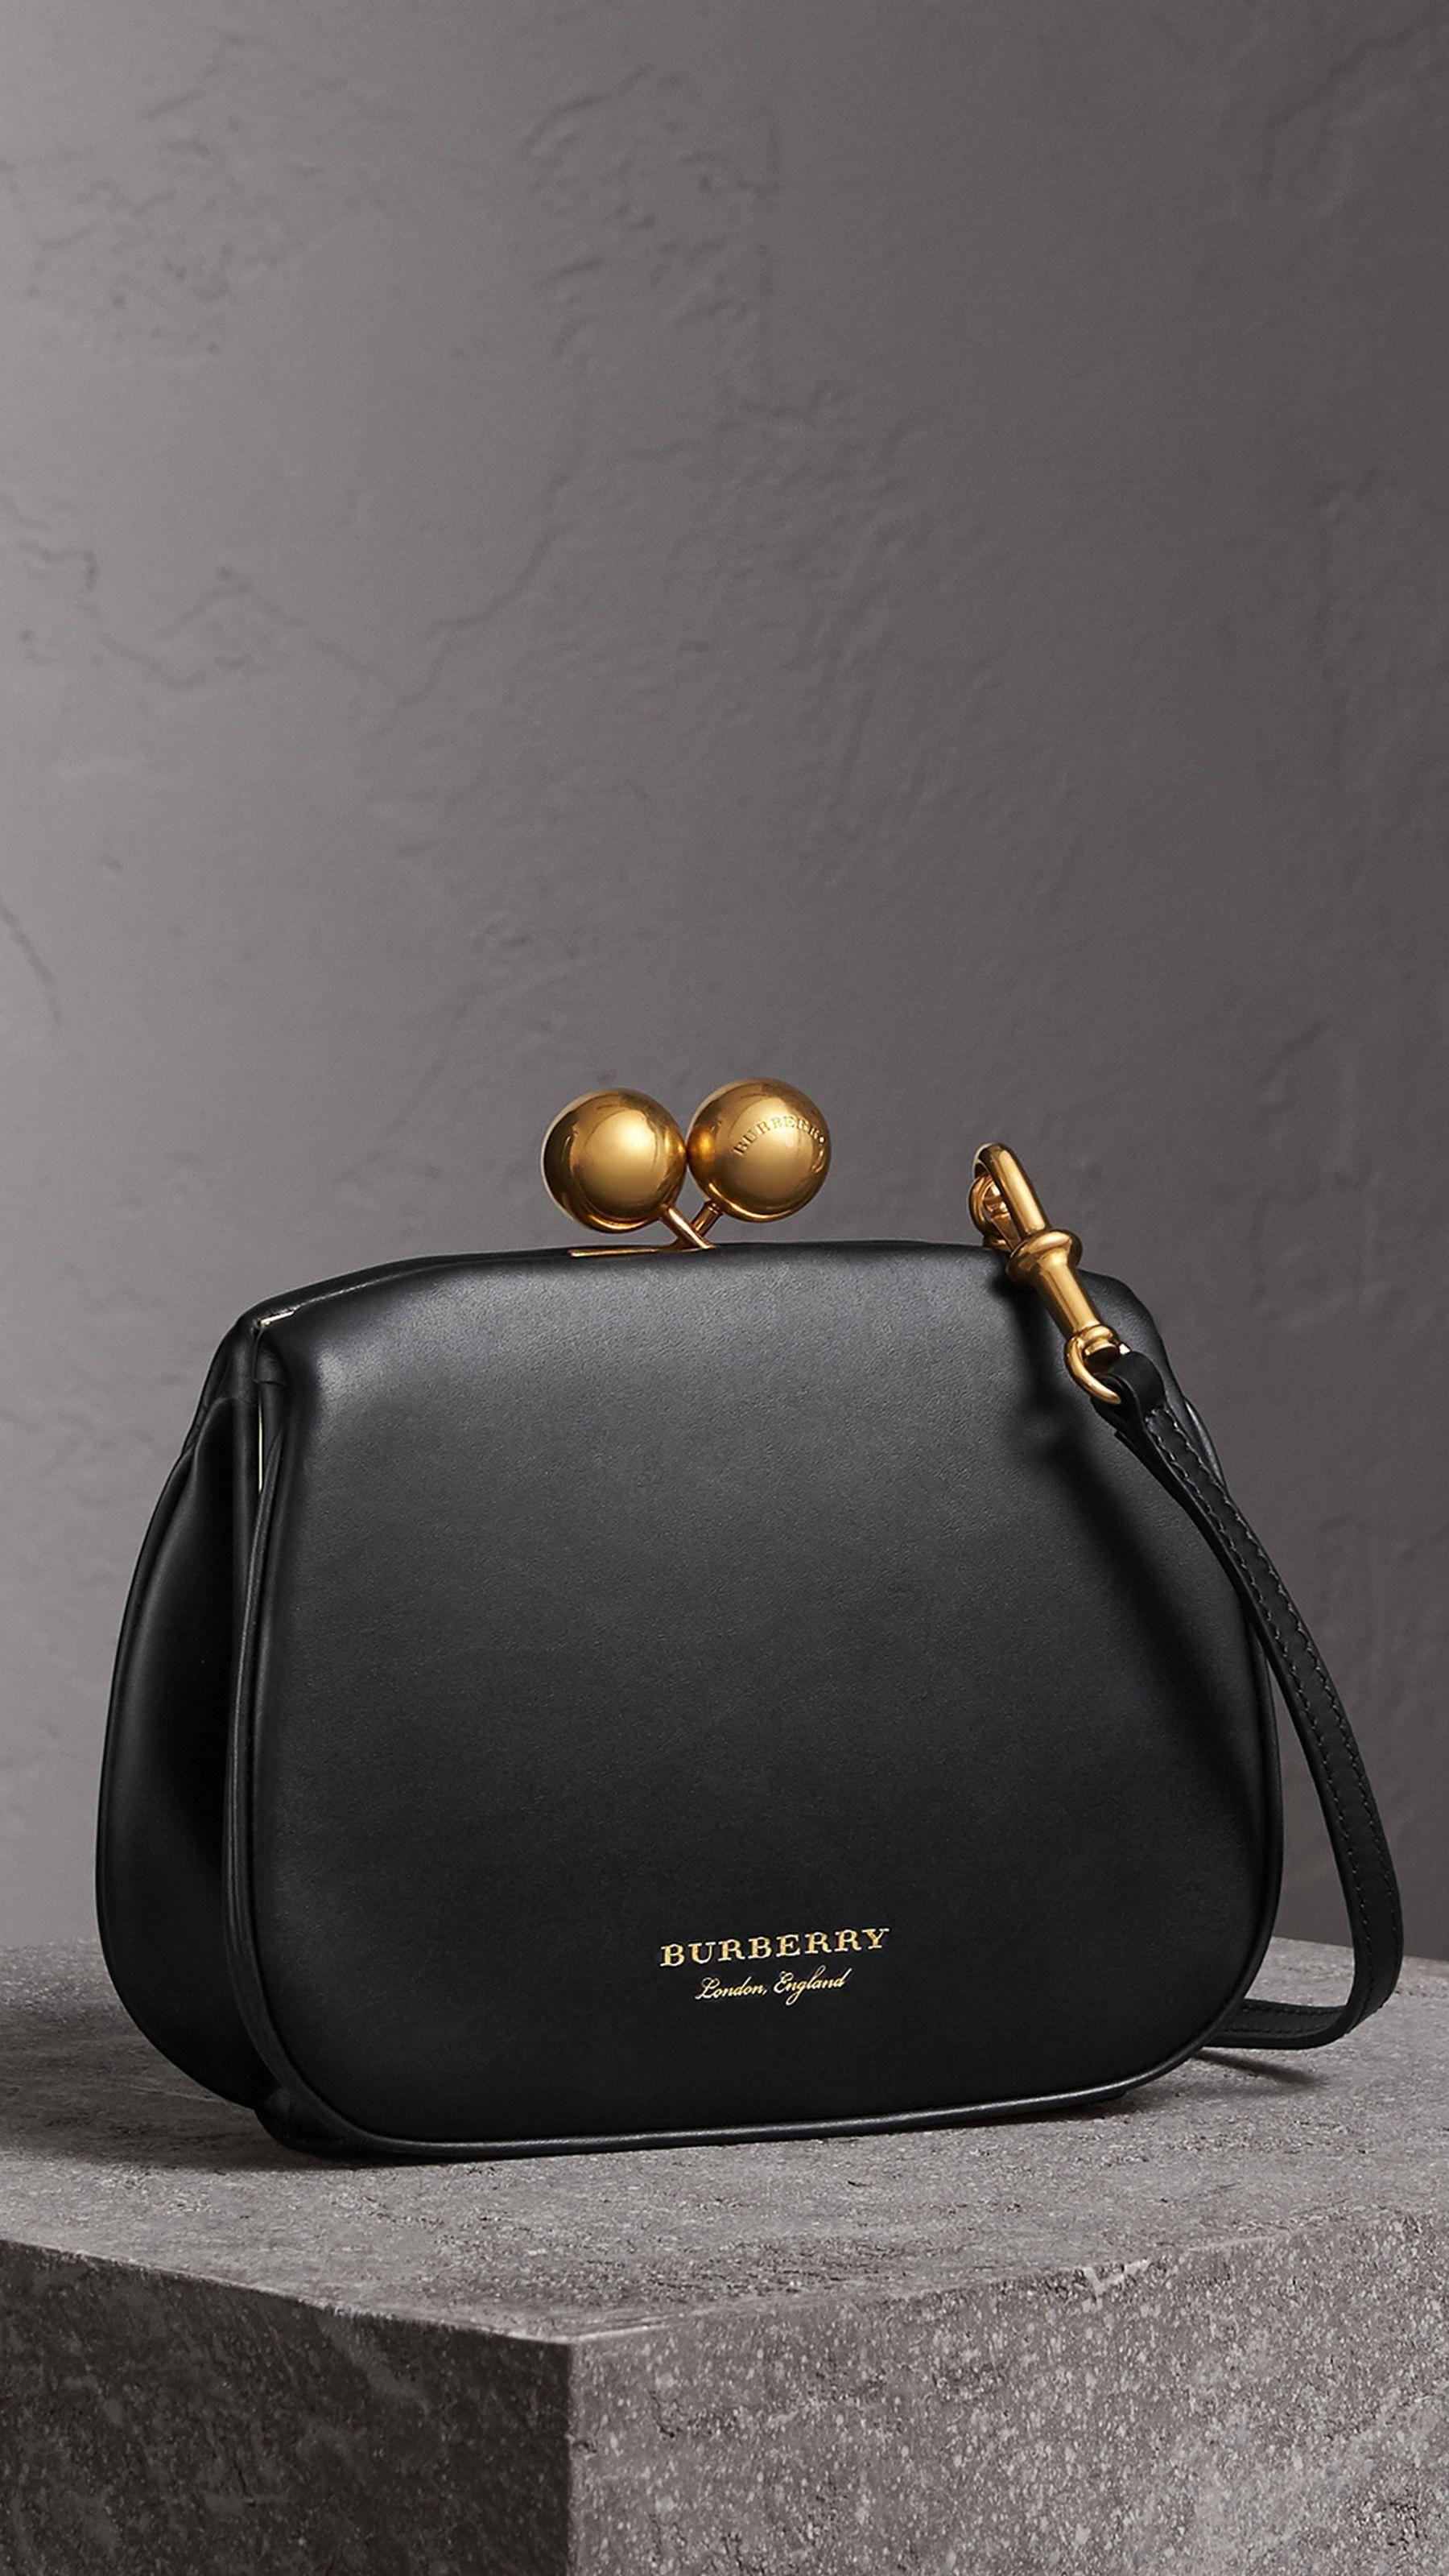 3b9edbc7548783 Small Leather Metal Frame Clutch Bag in Black - Women | Burberry United  States #clutchbags #Chanelhandbags